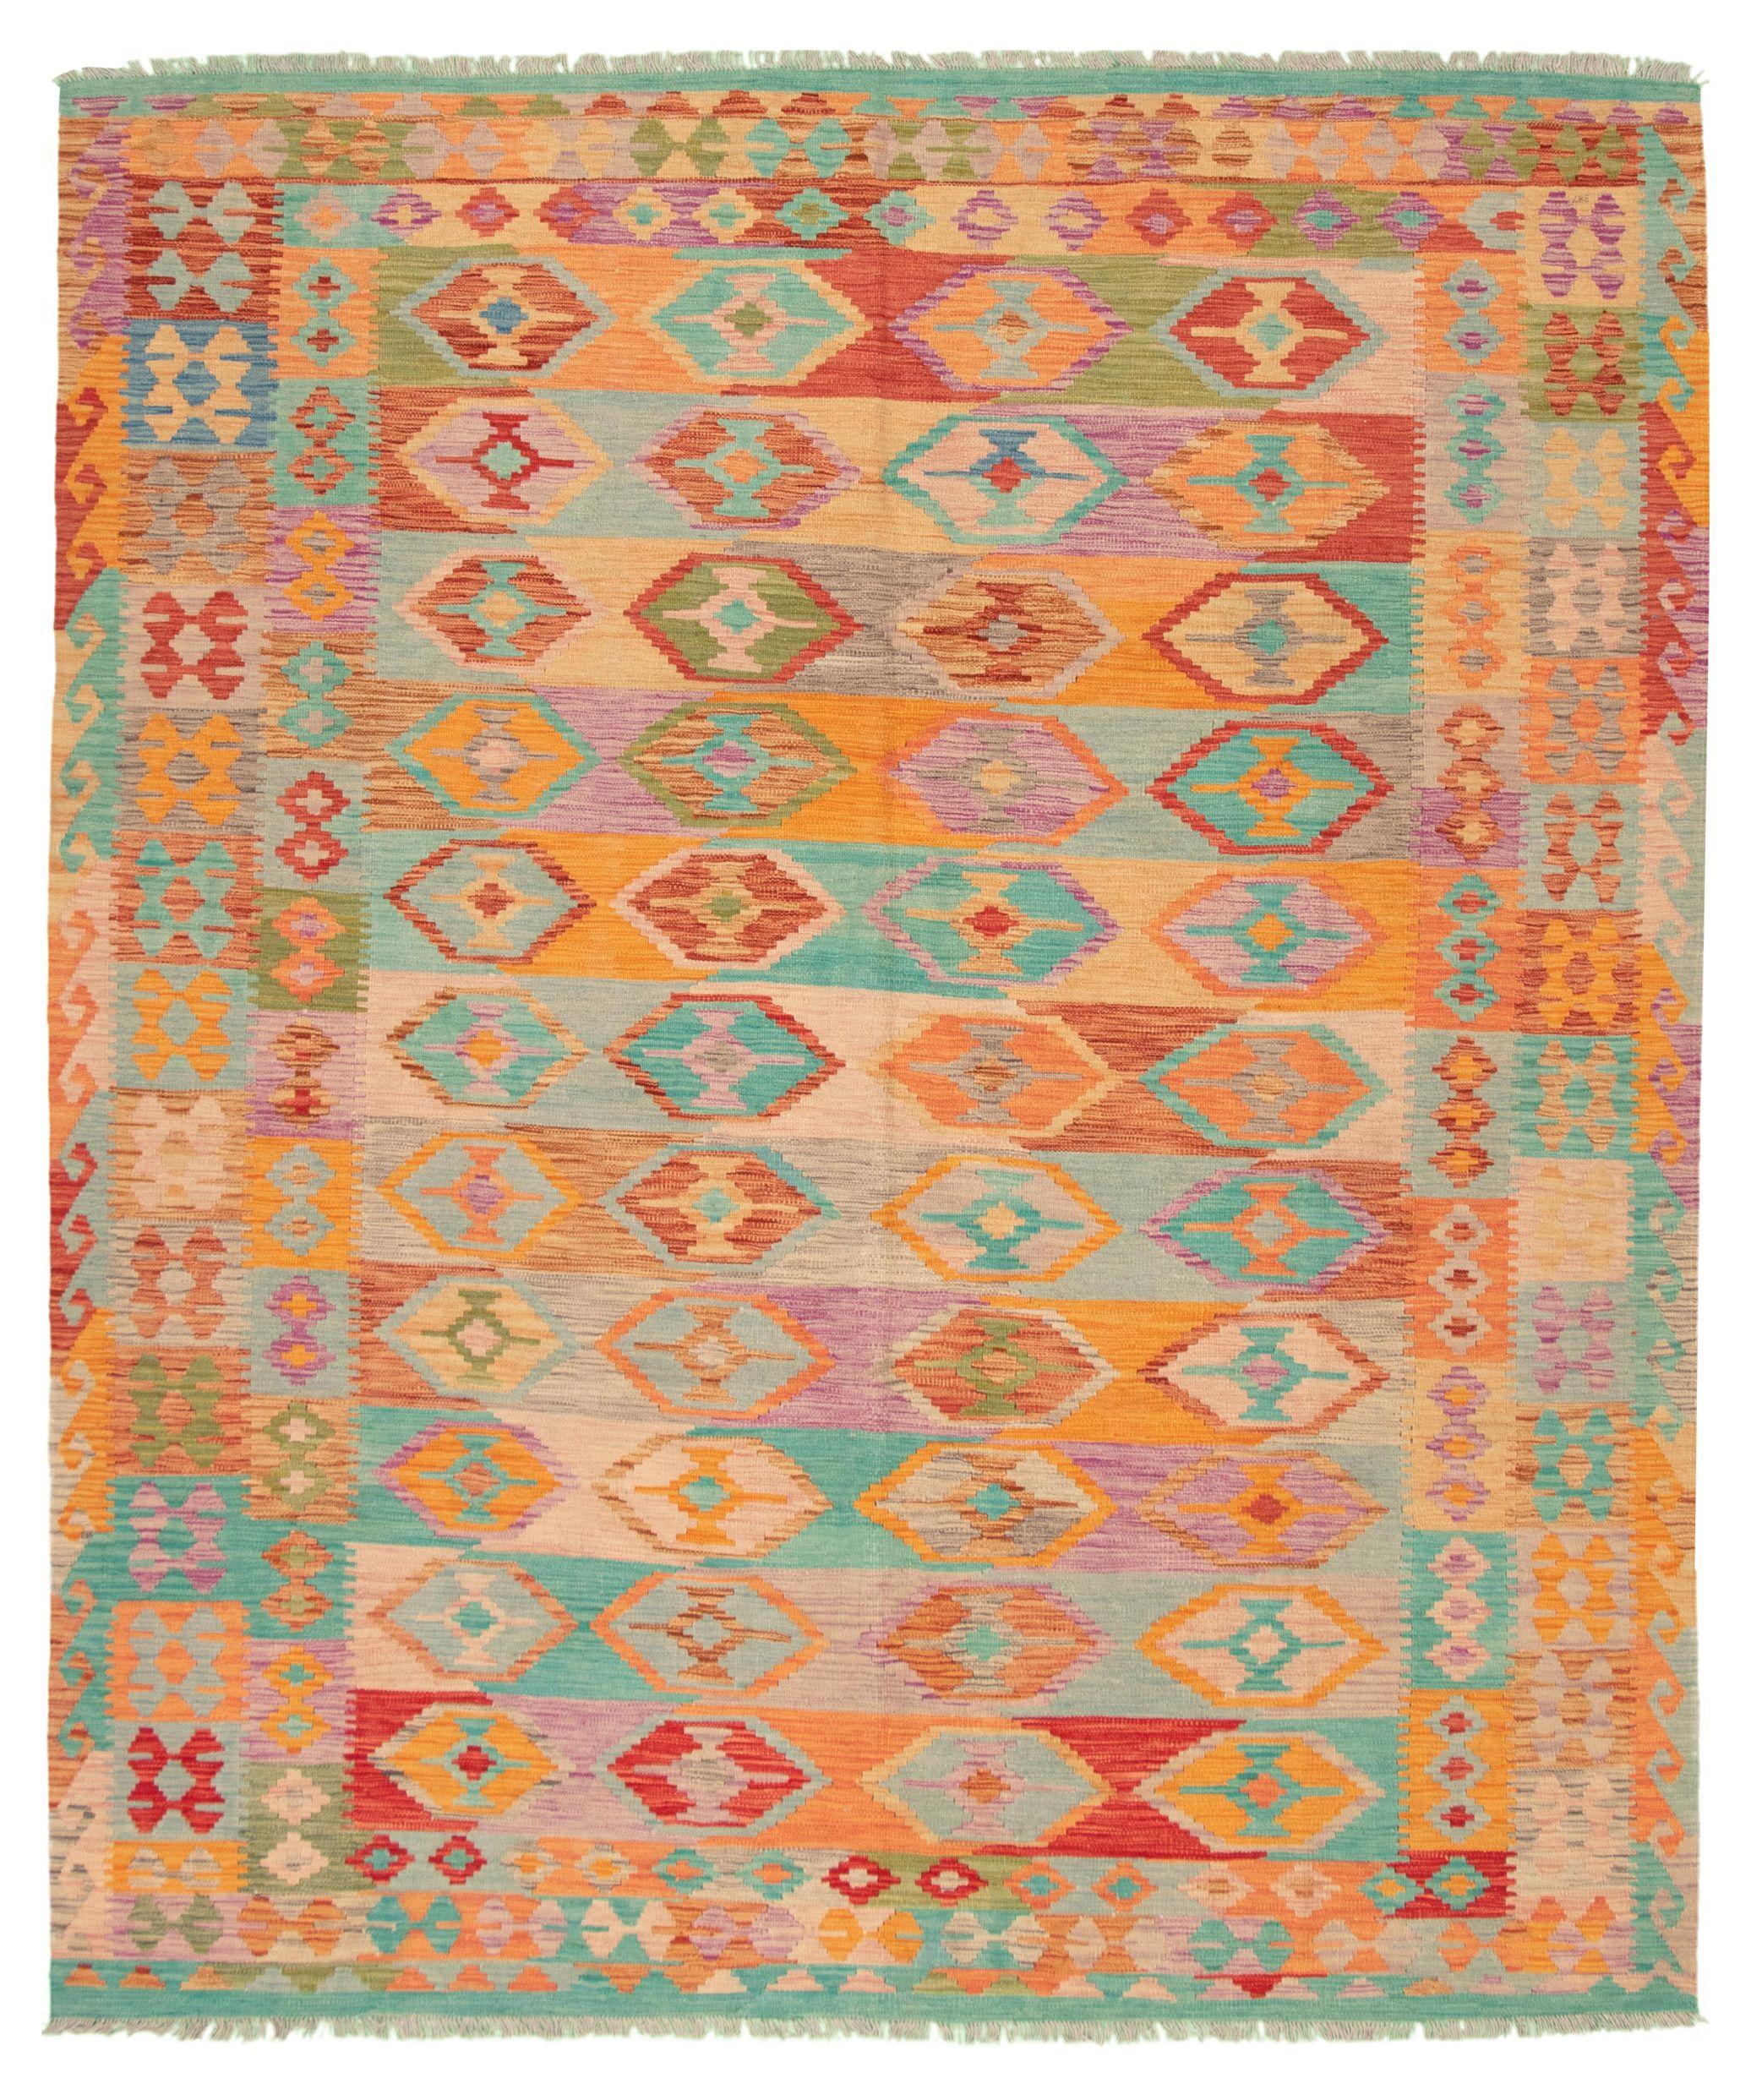 "Hand woven Bold and Colorful  Beige, Orange Wool Kilim 8'4"" x 10'2"" Size: 8'4"" x 10'2"""